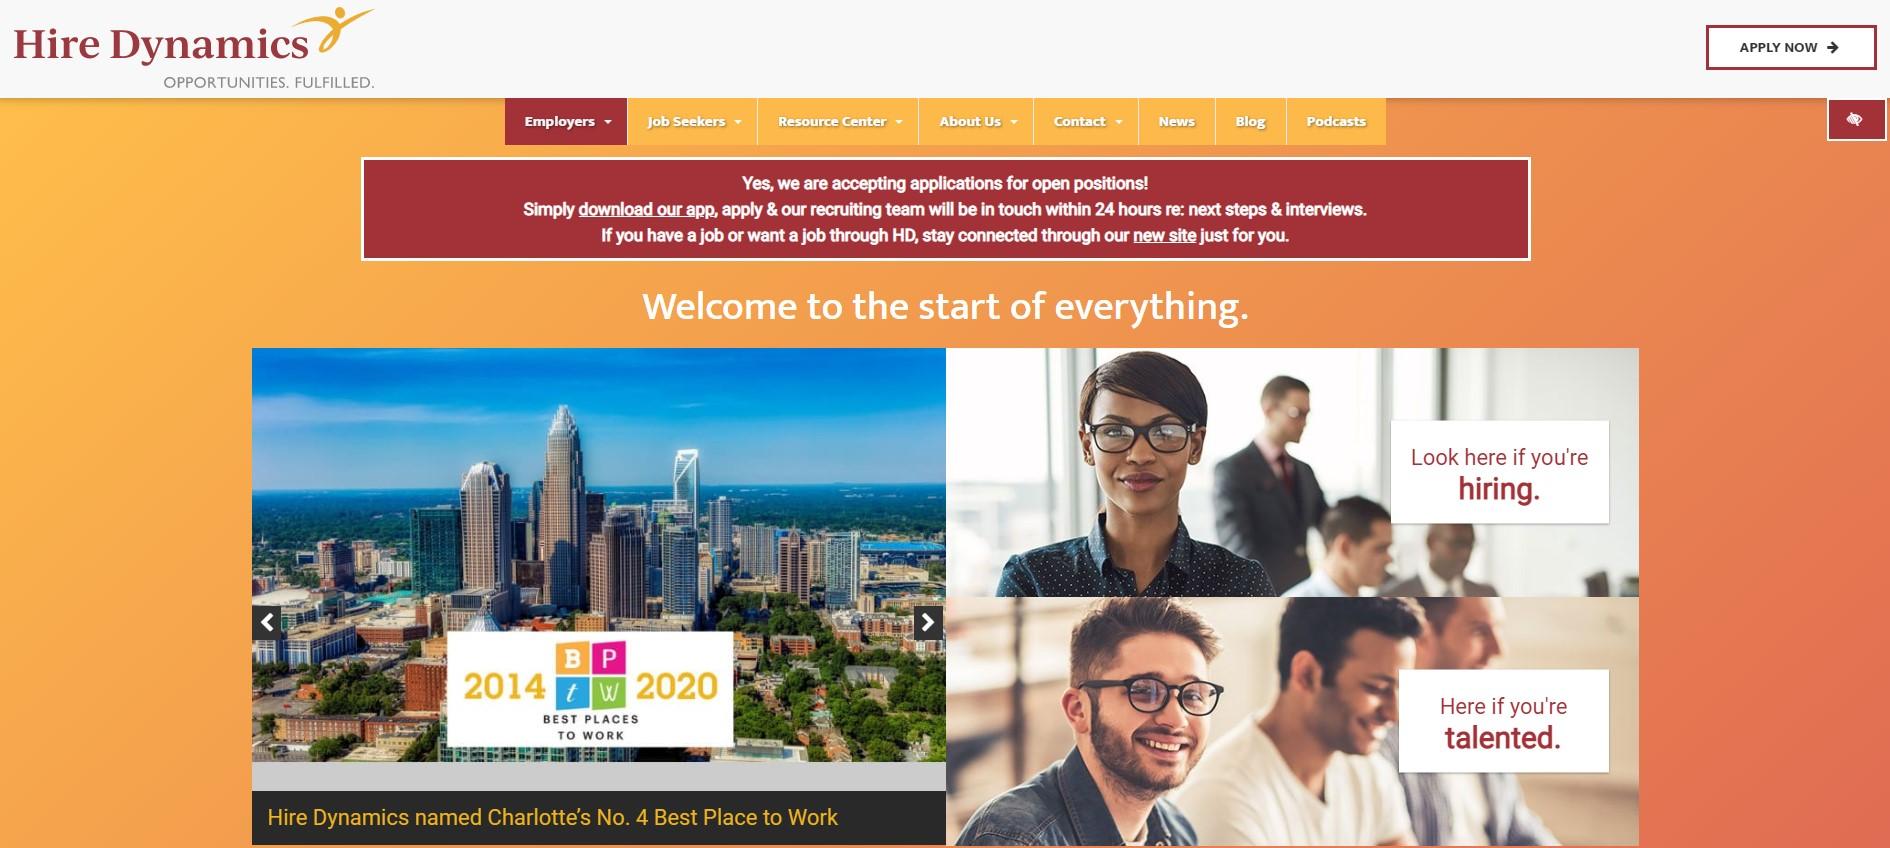 Hire Dynamics - Best Atlanta Staffing Agencies